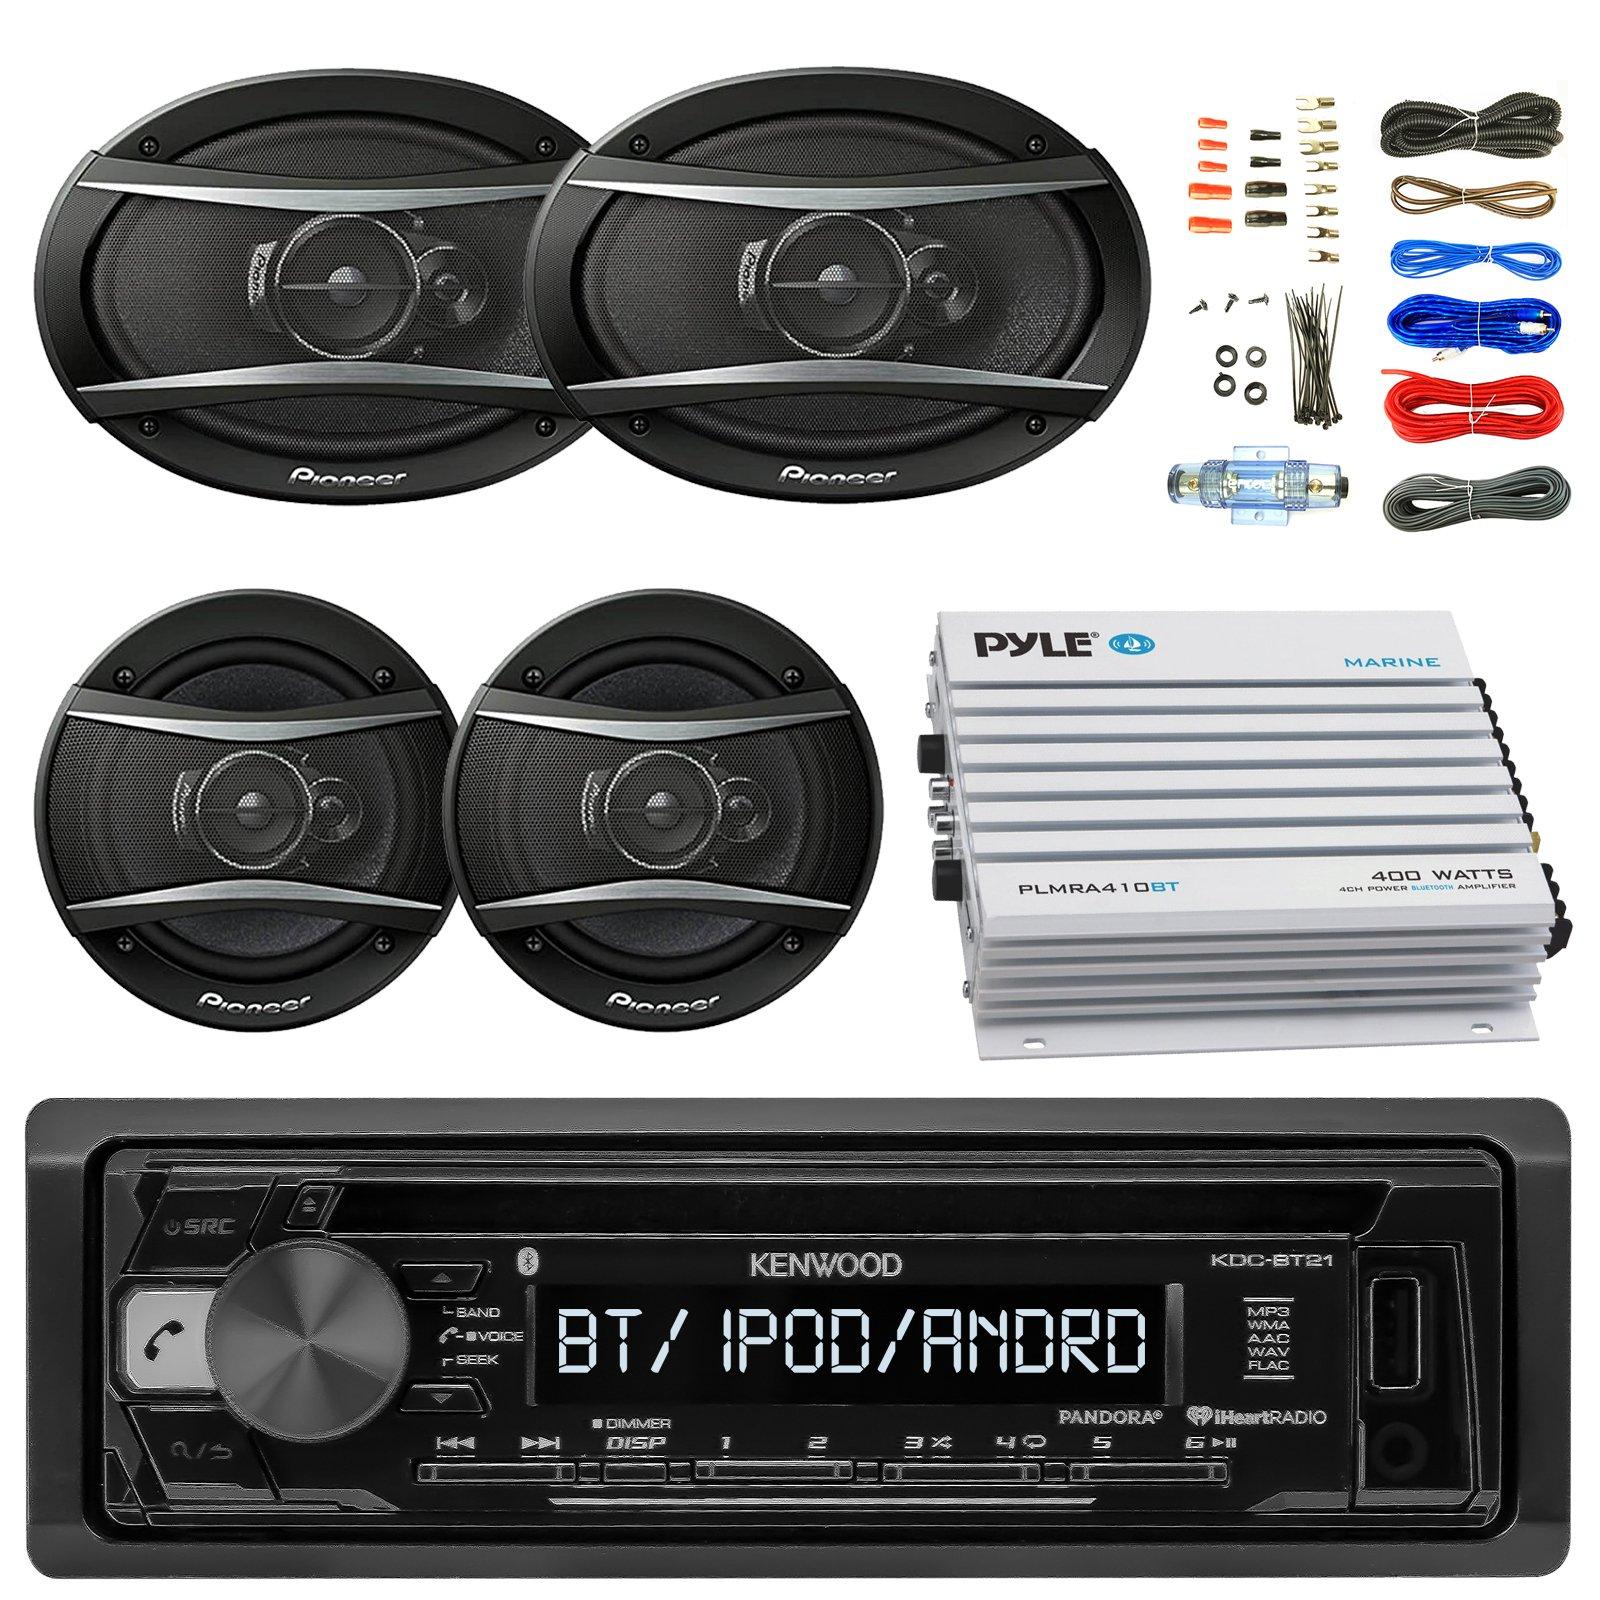 Kenwood KDCBT21 Car Bluetooth Radio USB AUX CD Player Receiver - Bundle With 2x TSA1676R 6.5'' 3-Way Car Audio Speakers - 2x 6.5''-6.75'' 4-Way Stereo Speaker + 4-Channel Amplifier + Amp Kit